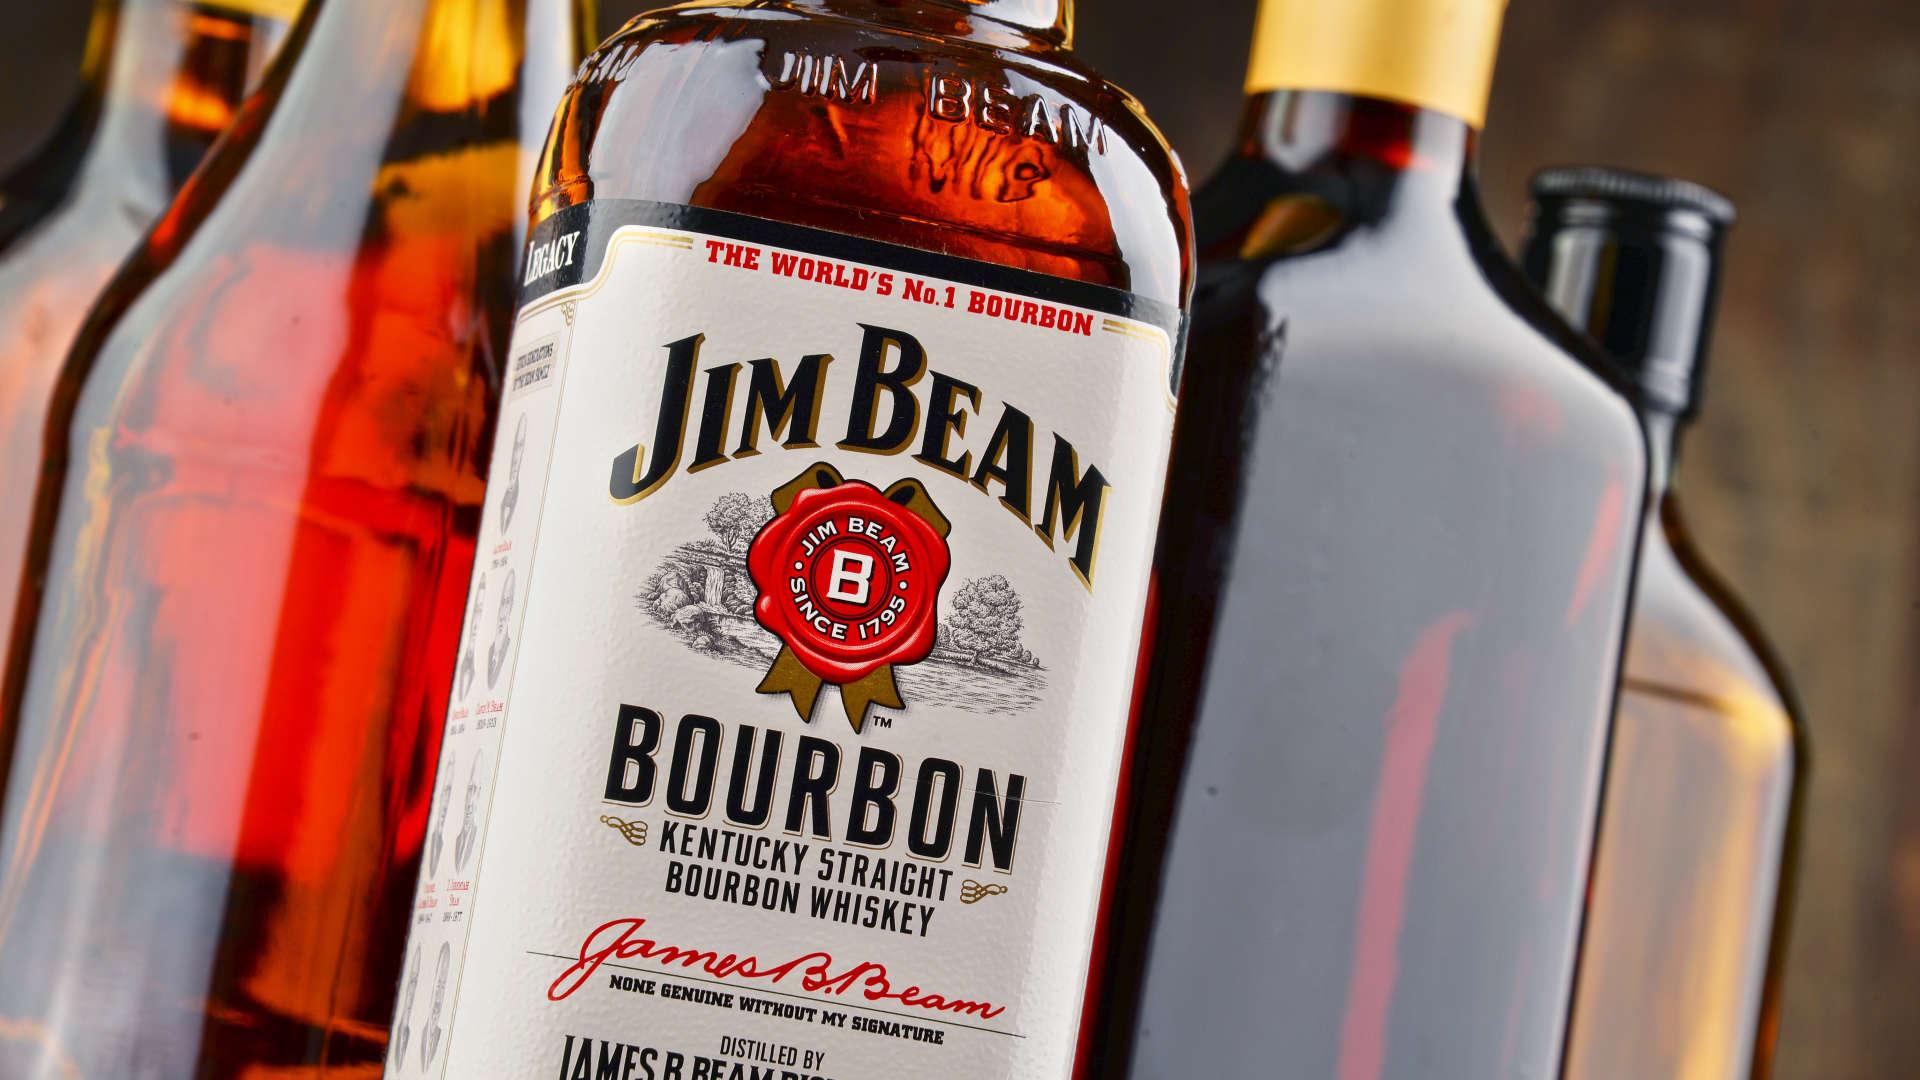 jim beam bottle hd wallpaper 66440